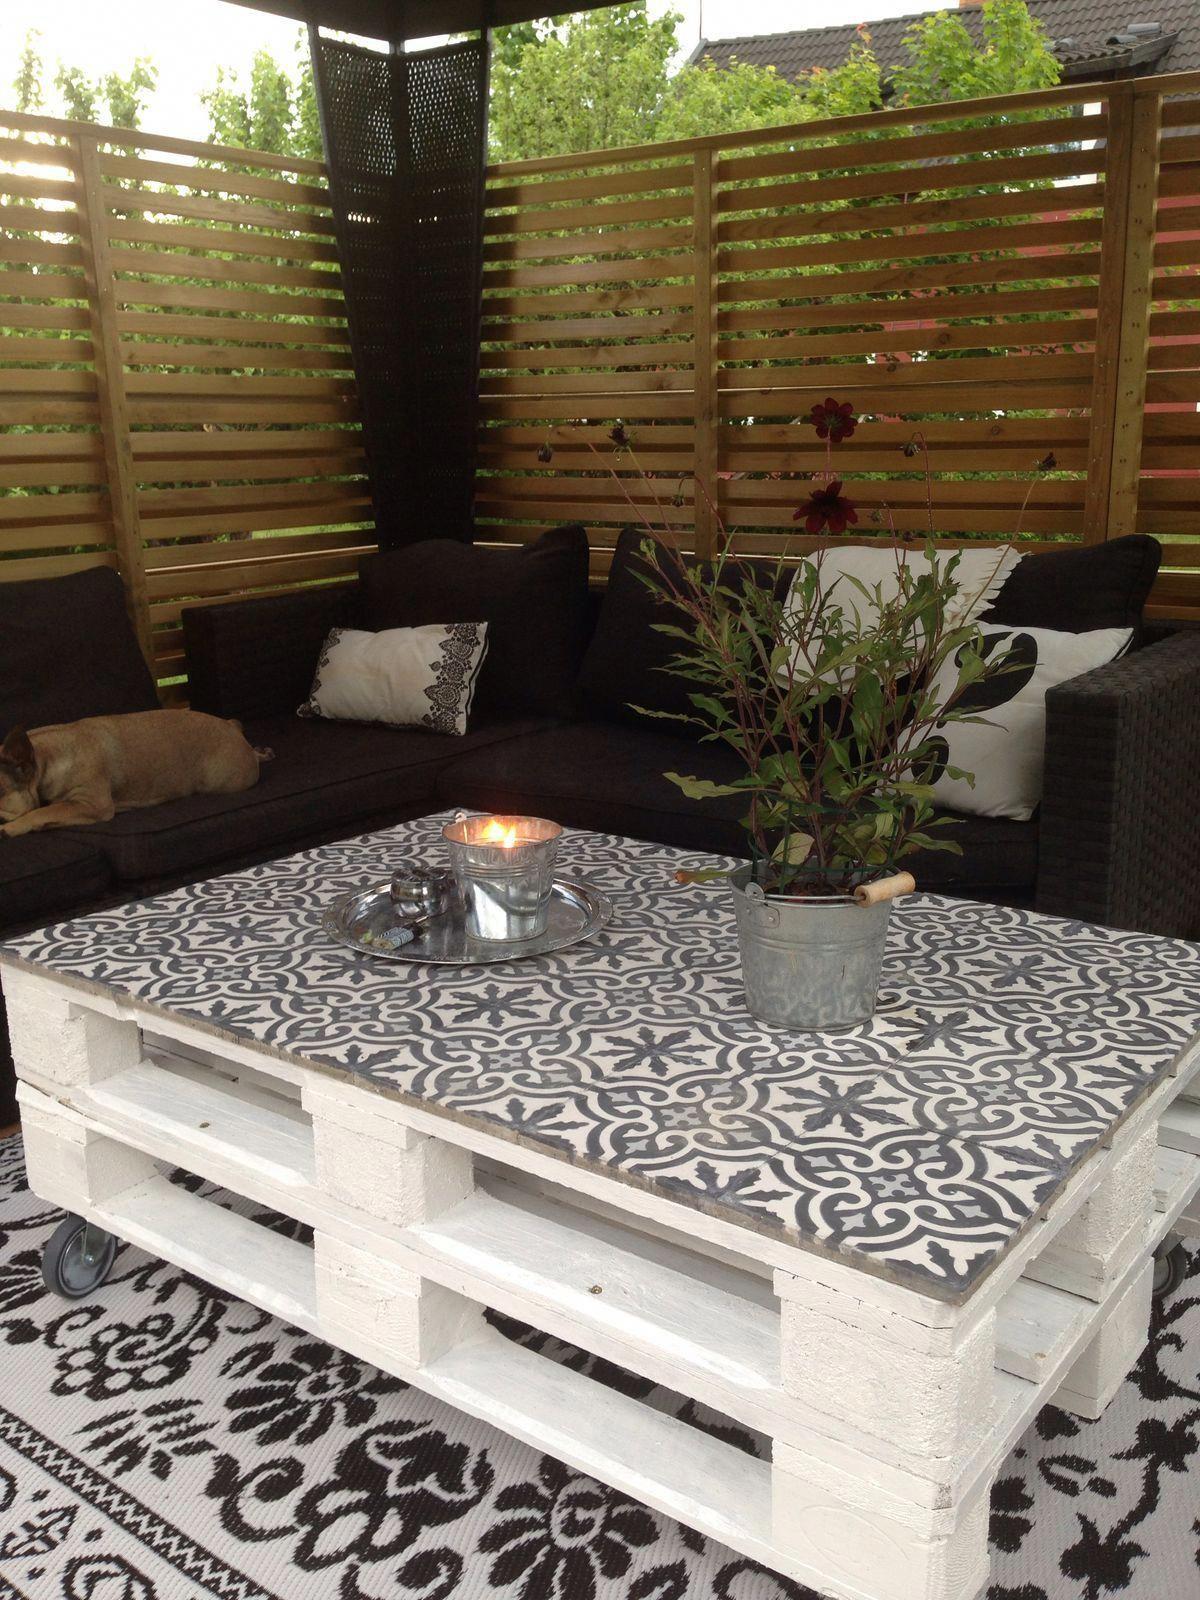 Pin By Diy Farmer Direct On Pallet Gardenin Outdoors Pallet Garden Furniture Diy Garden Furniture Pallet Furniture